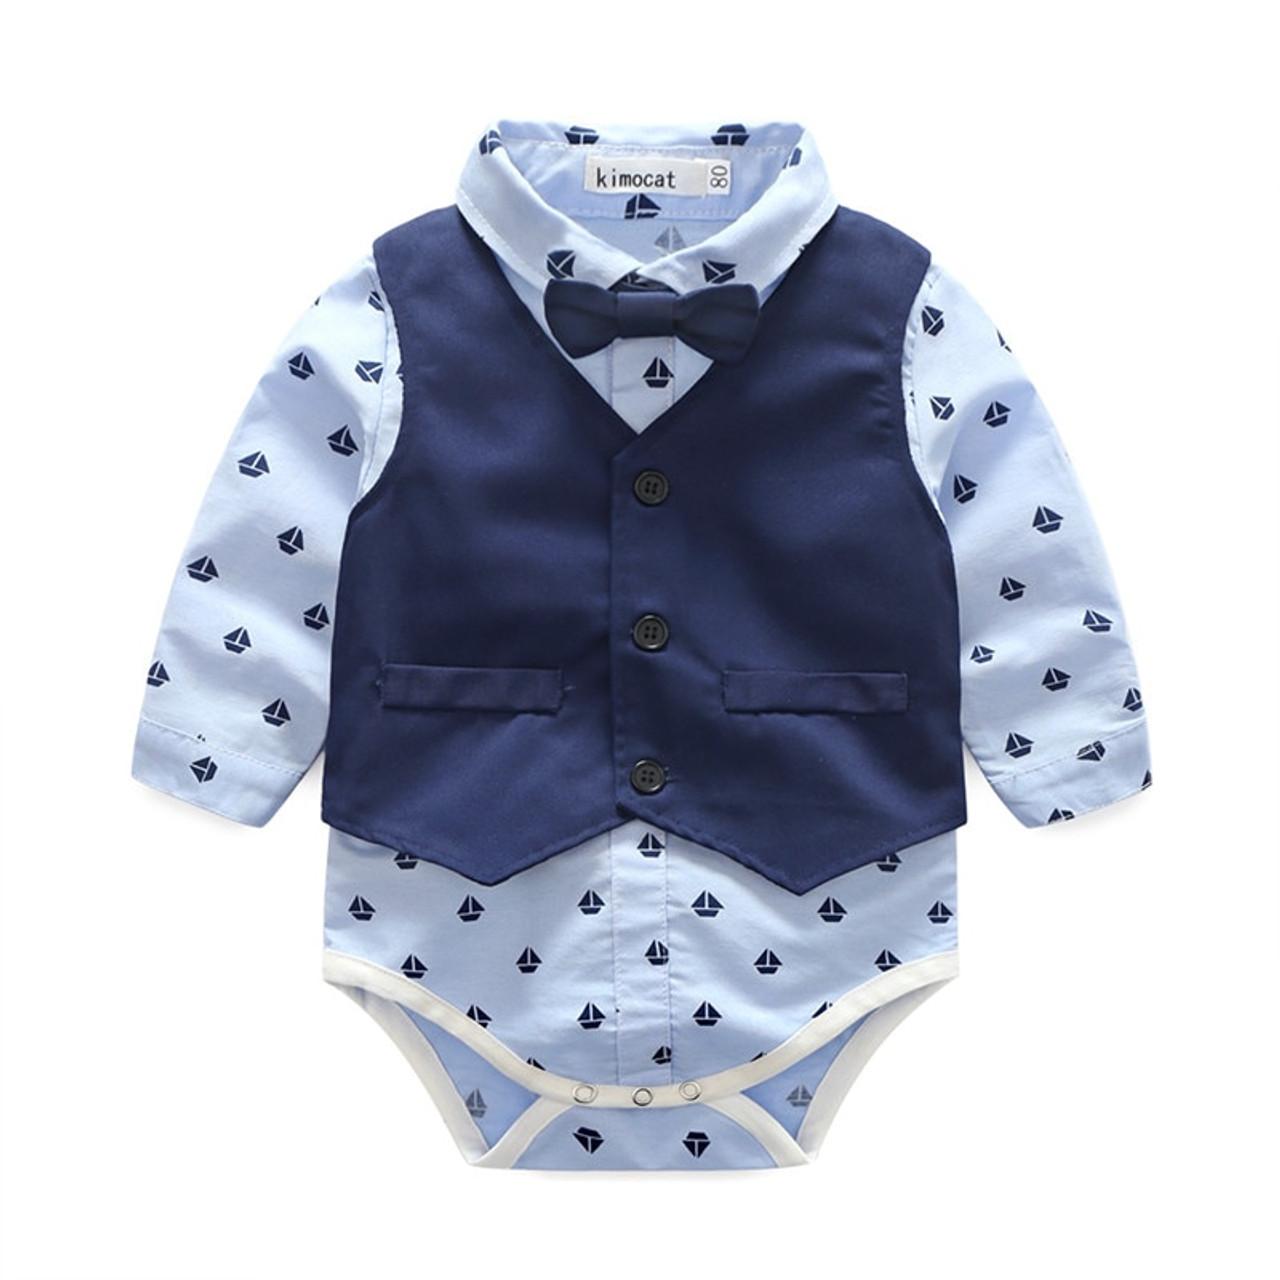 7fd5ecc9 ... Kimocat Infant Baby Boy Gentleman Clothes For Weddings Formal Suit  Vest+T-Shirt+ ...